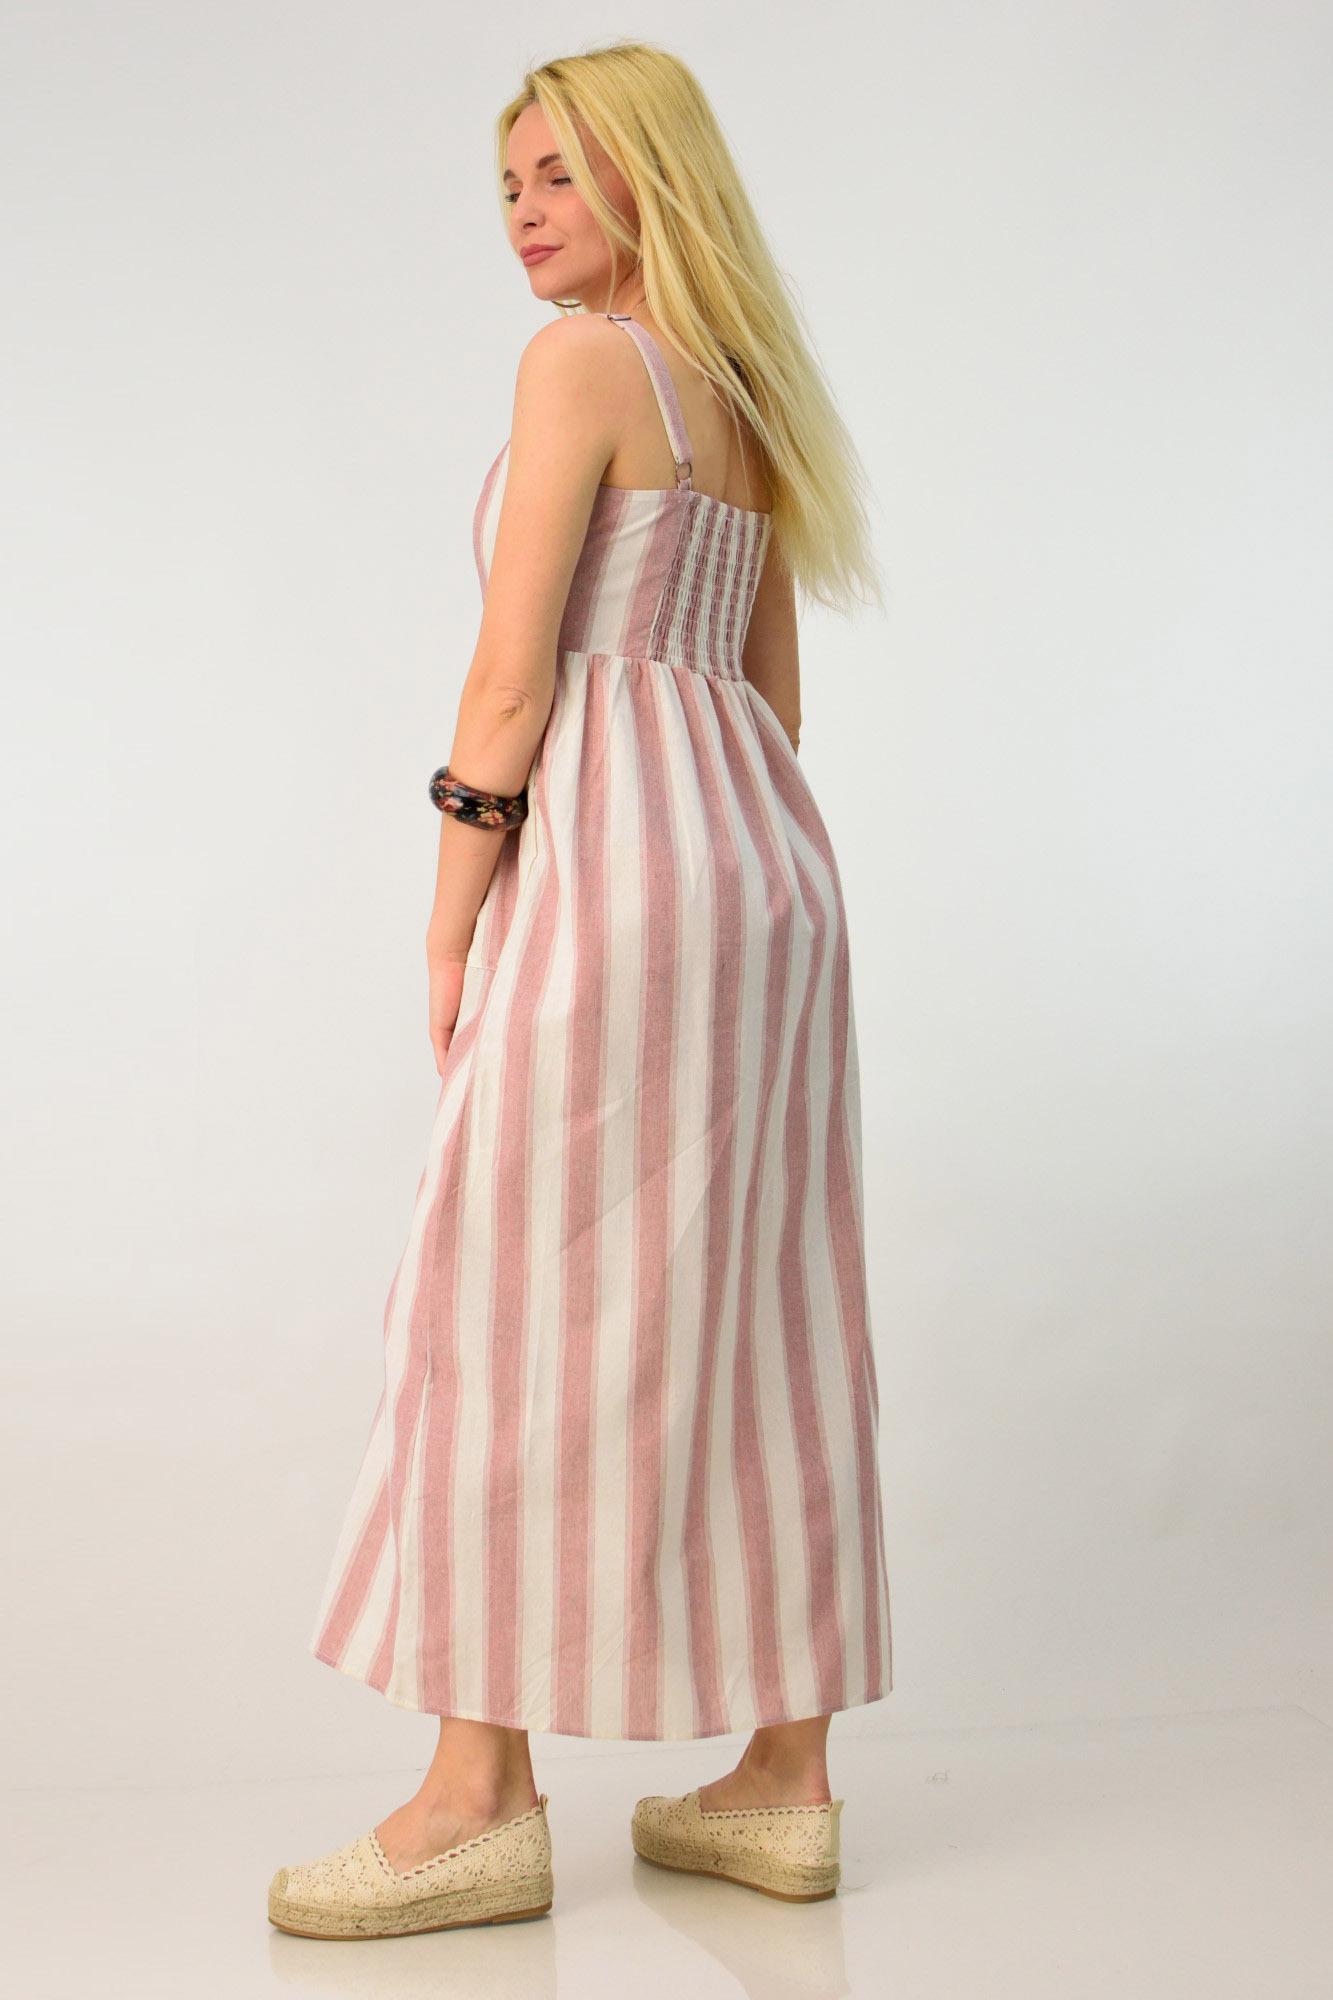 b2fb34c25d5d Λινό φόρεμα με τσέπες. Tap to expand